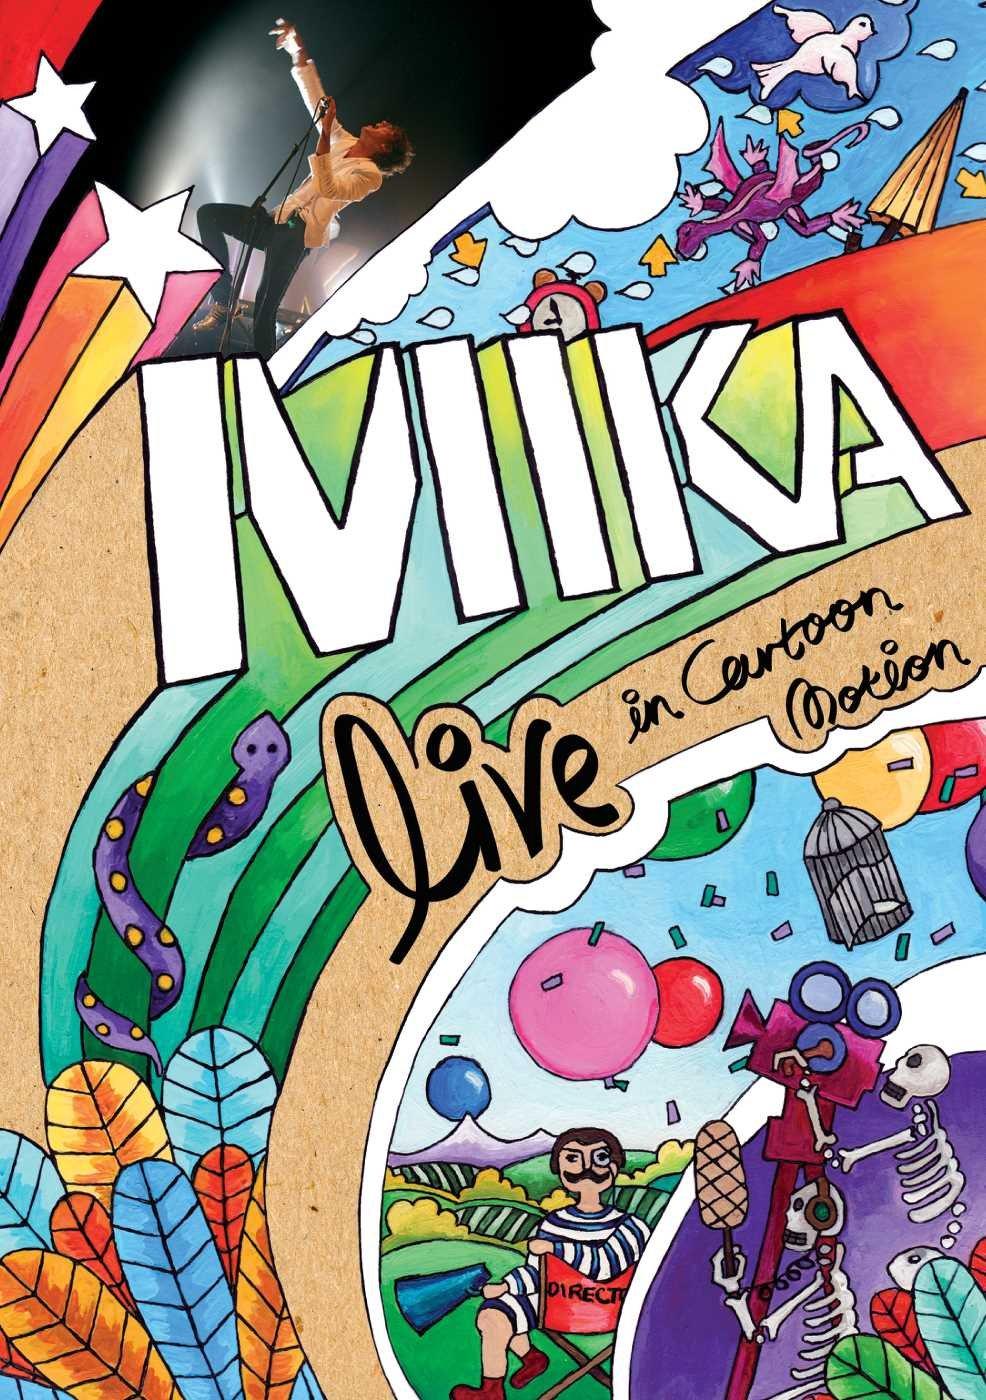 Mika Mika. Live In Cartoon Motion mika waltari riigi saladus